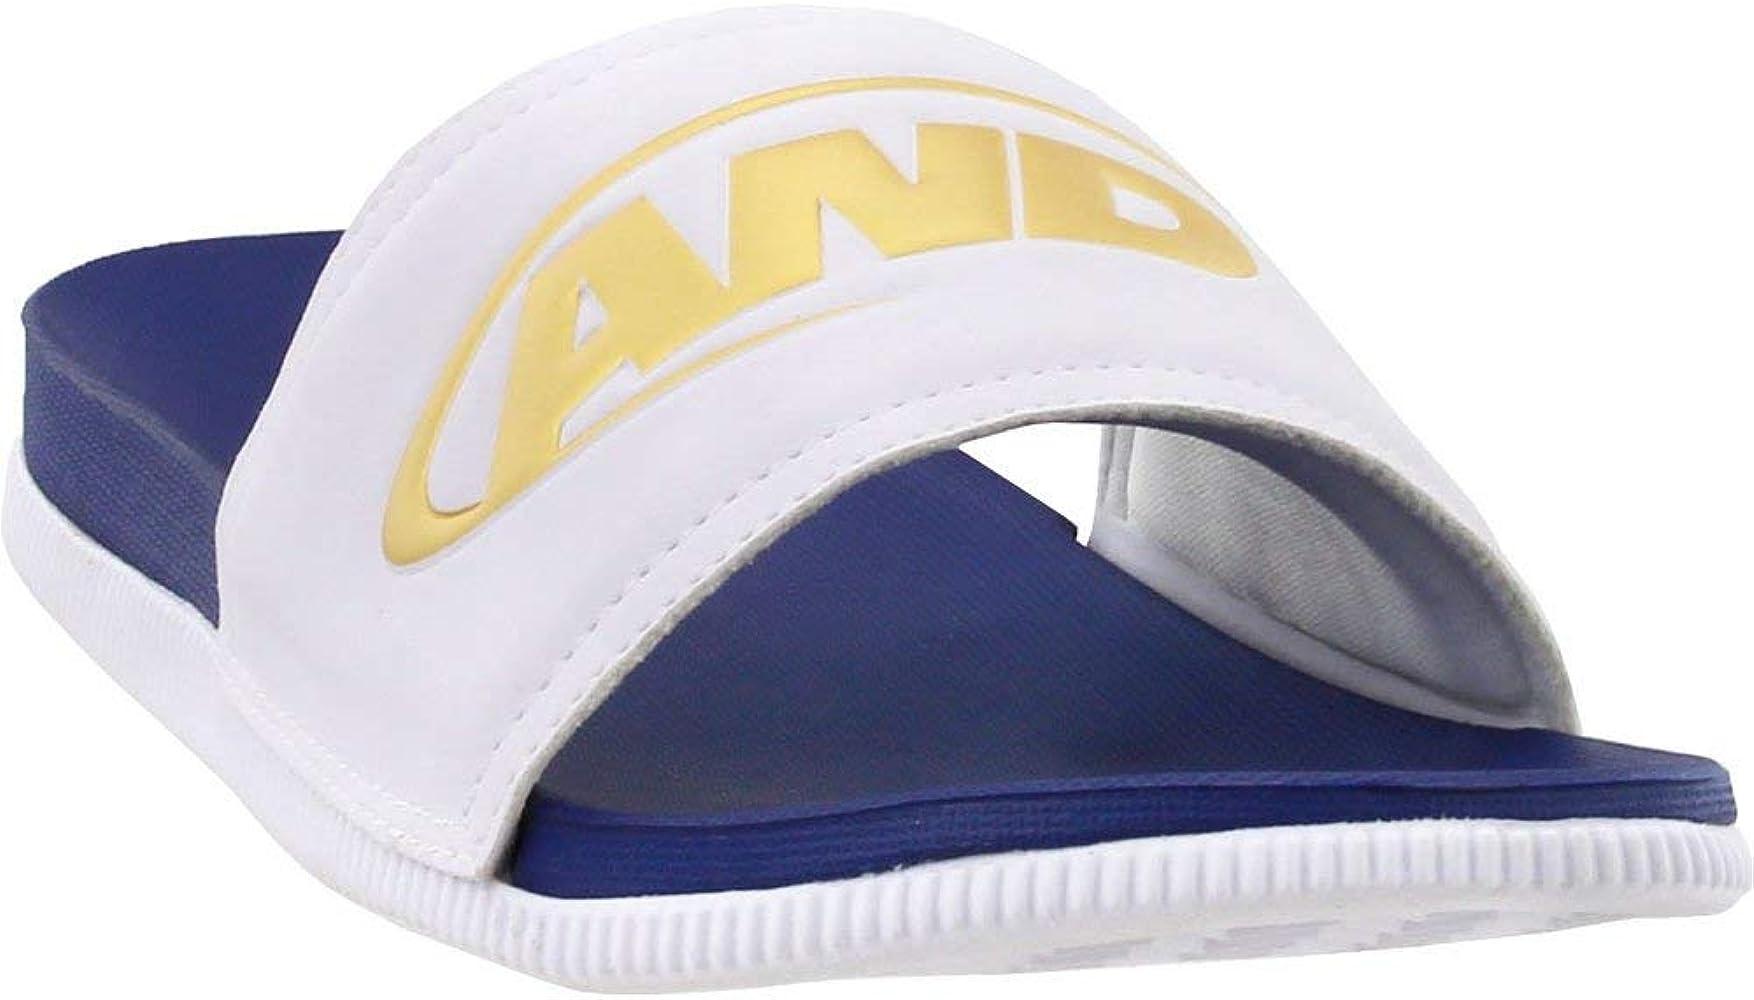 267cb1e2e13a5 Men's Haven Basketball Shoe White/Pale Gold/True Navy 12 M US